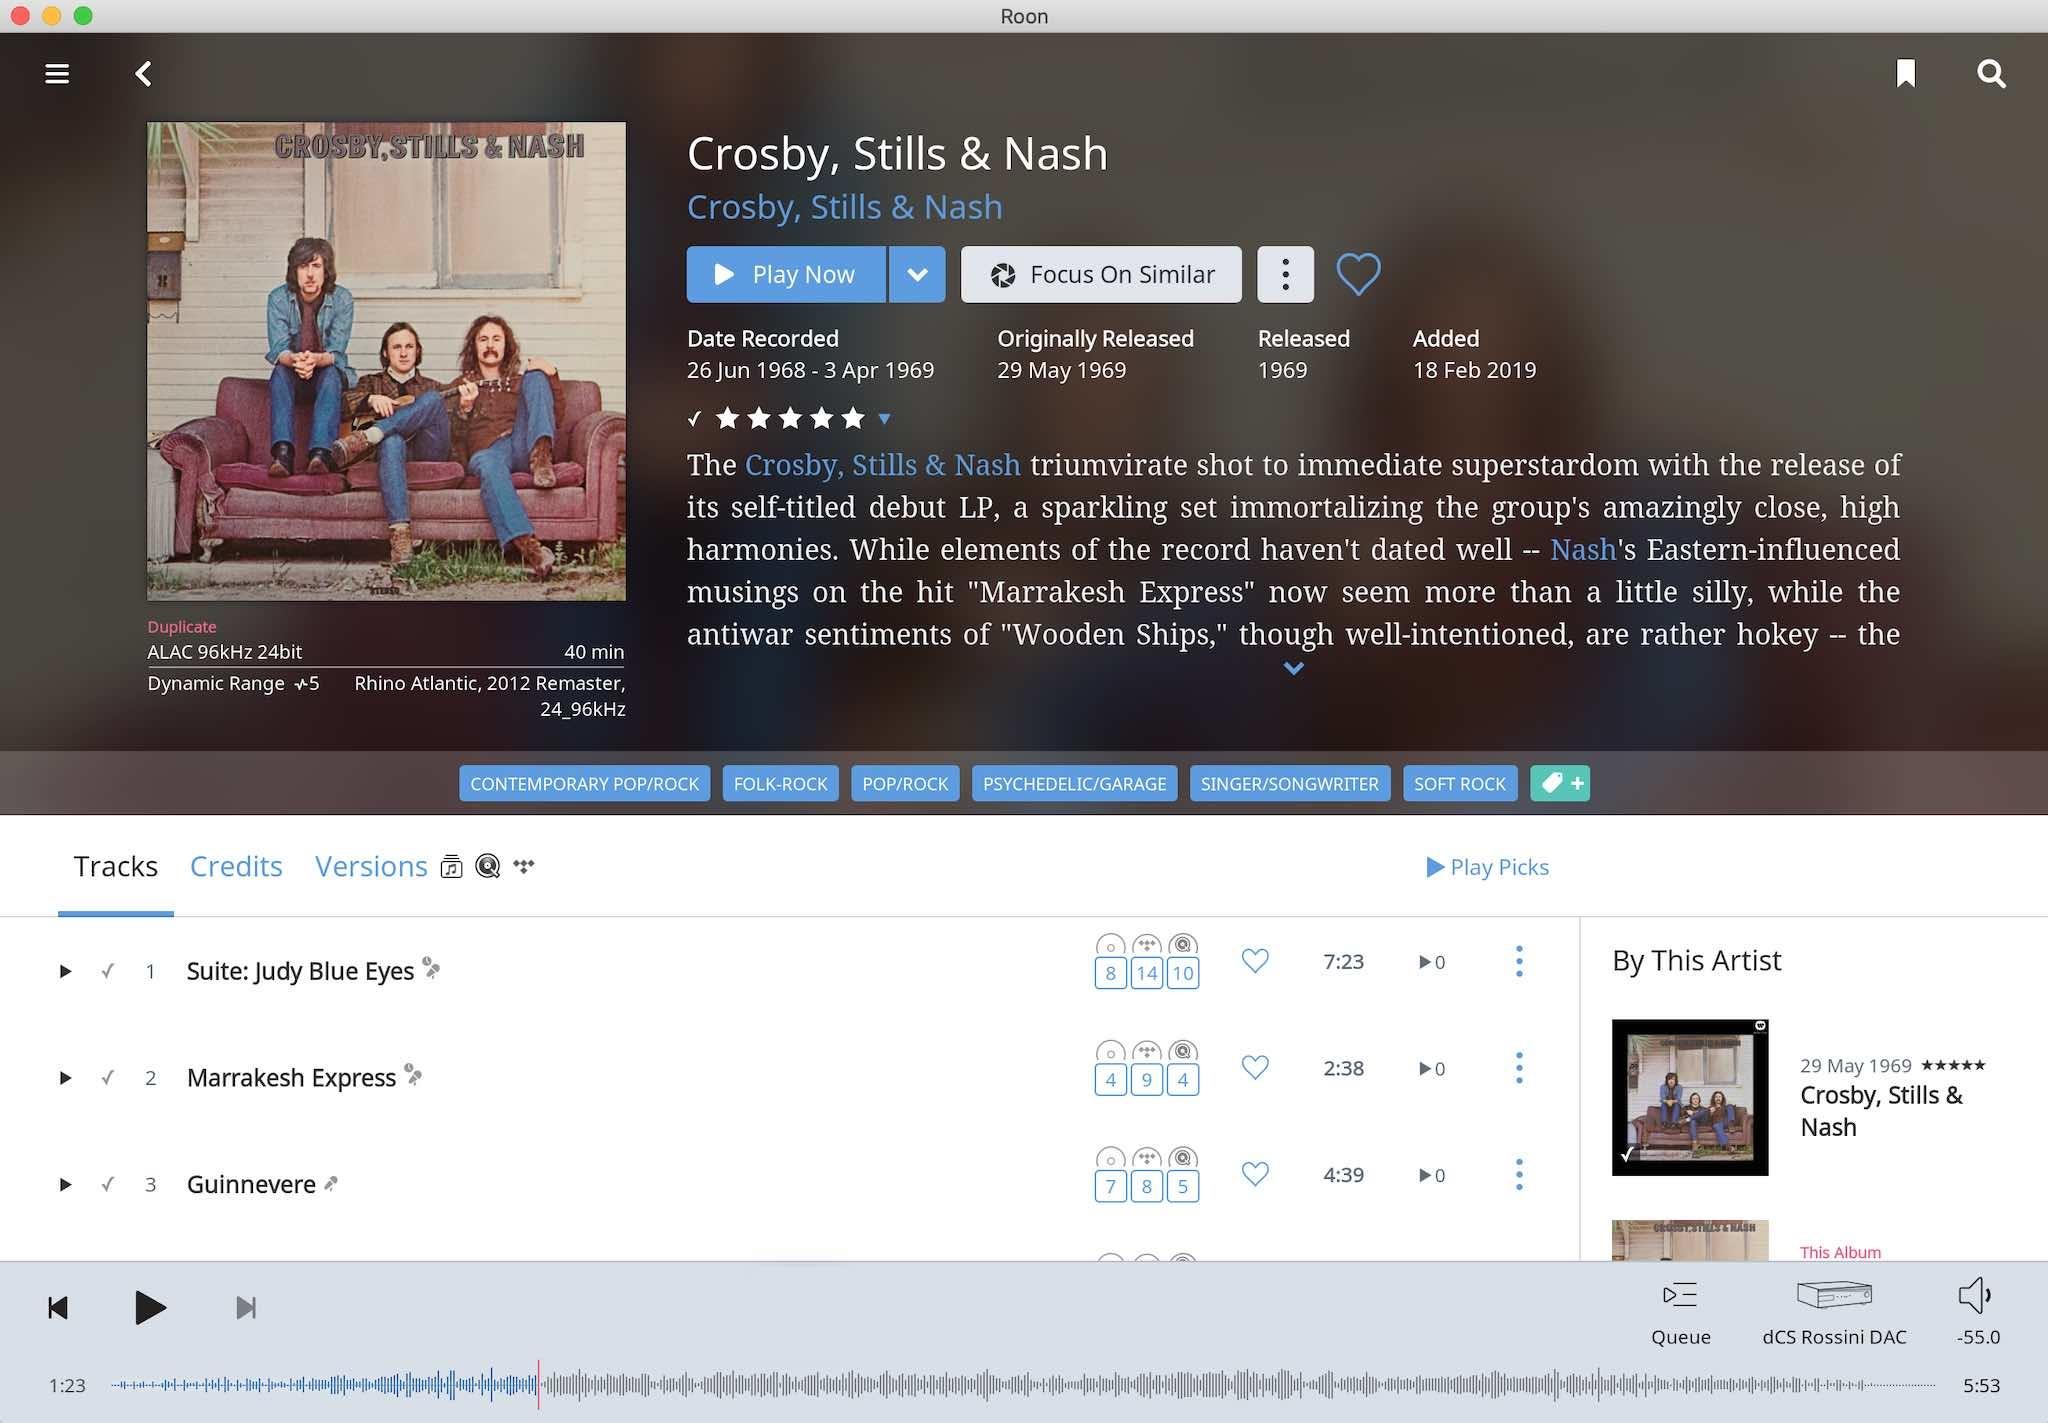 The Best Version Of… Crosby, Stills & Nash Self-Titled Debut